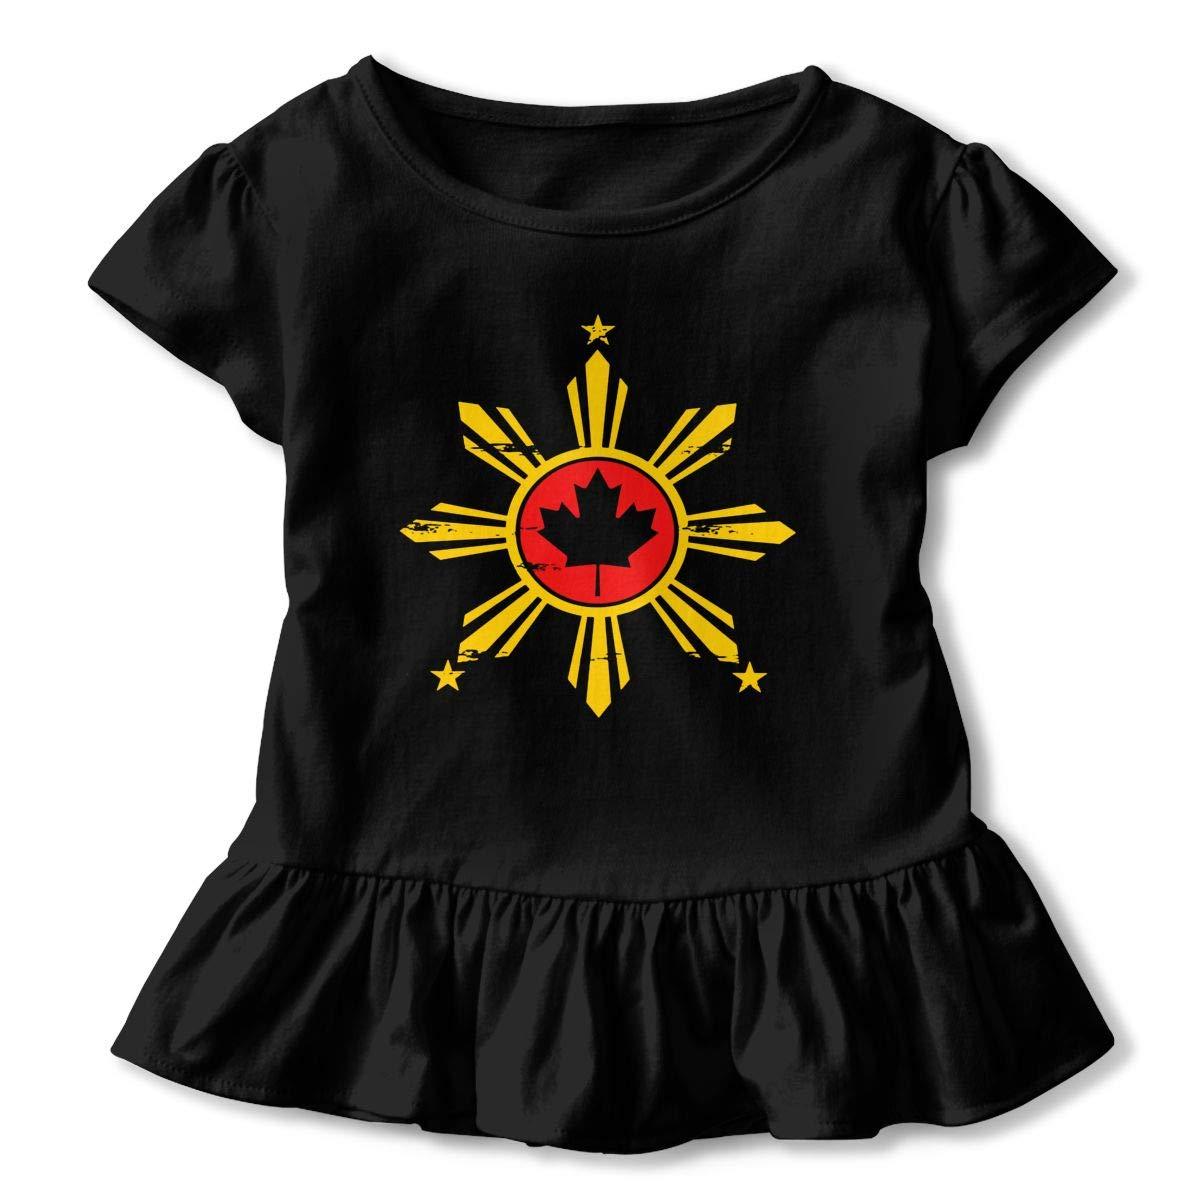 Kcloer24 Unisex Toddler Filipino Canadian Flag Organic Short Sleeve Ruffles Tee T-Shirt for 2-6 Years Old